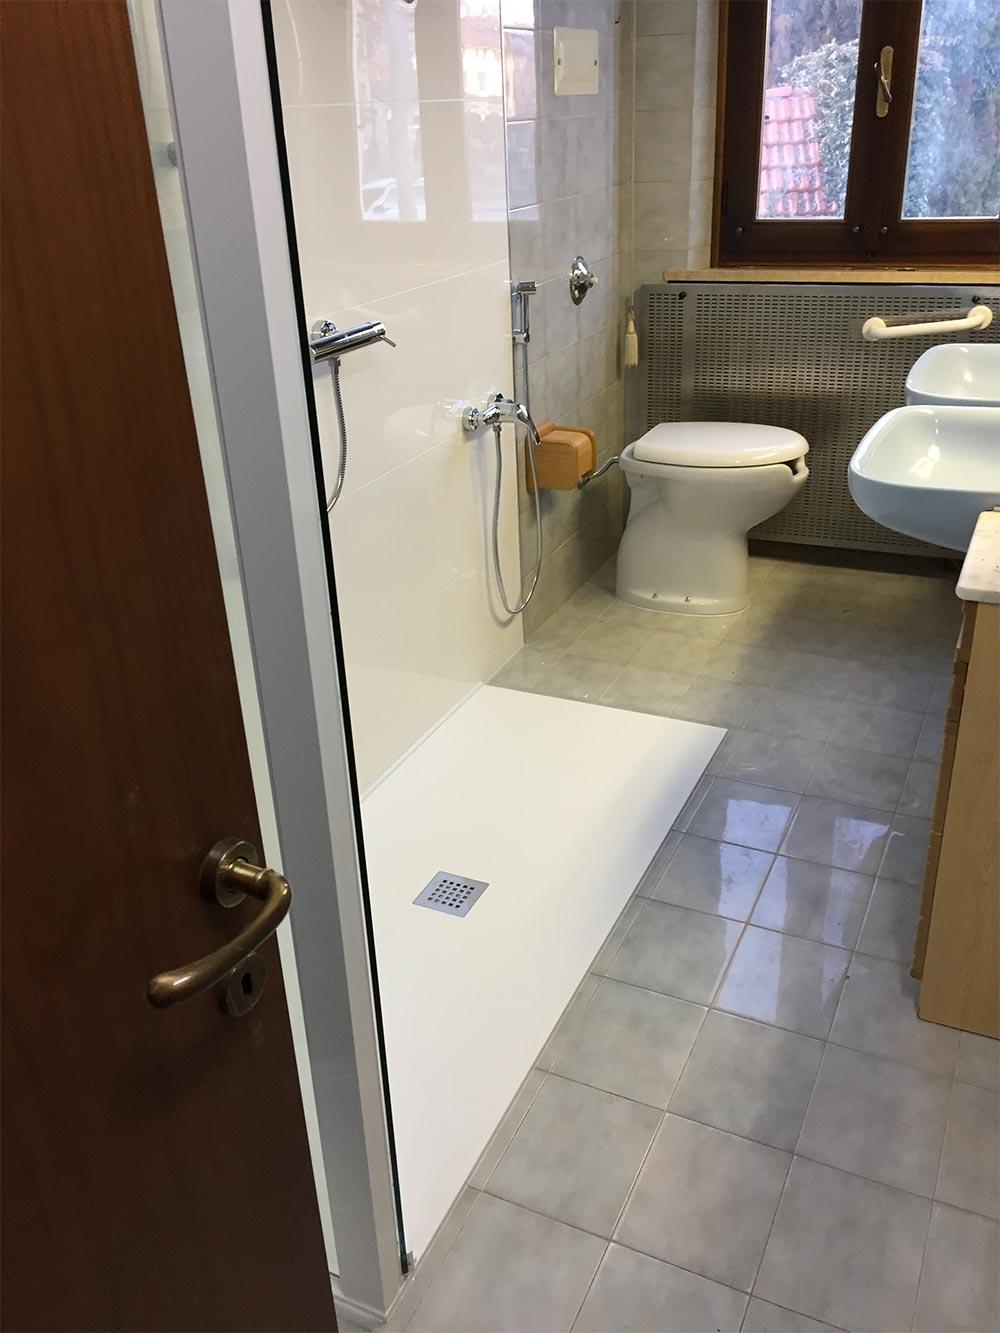 Veneta vasche forniture ed installazione vasche da bagno - Paraspruzzi per vasca da bagno ...